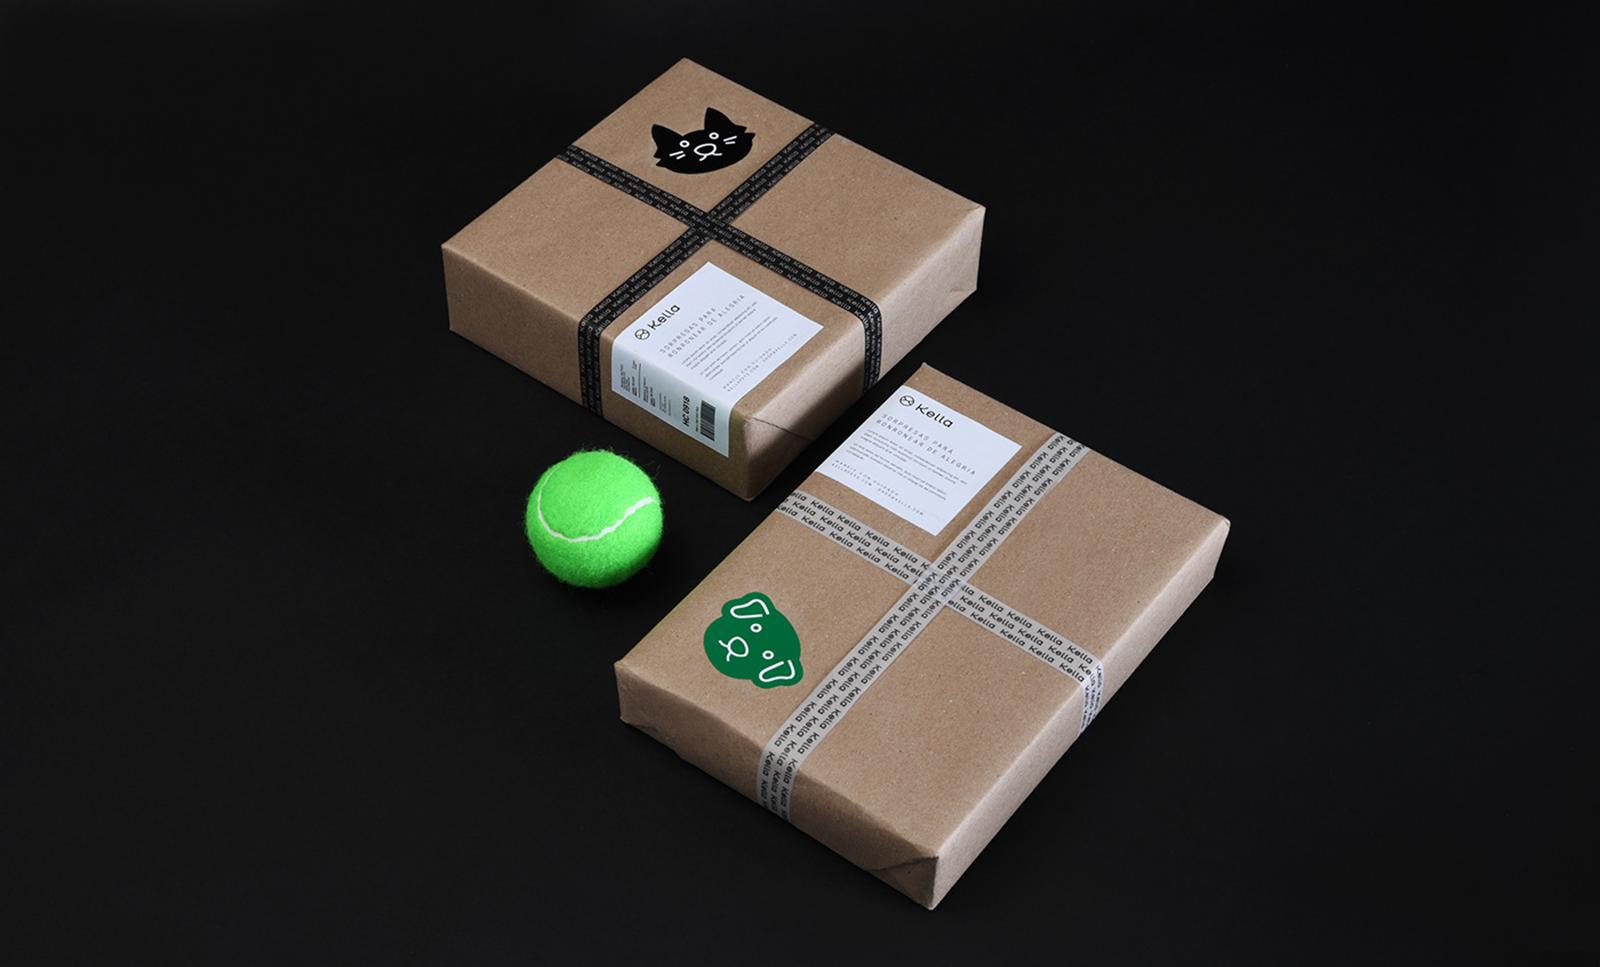 Kella宠物食品品牌视觉VI形象设计欣赏-深圳VI设计10